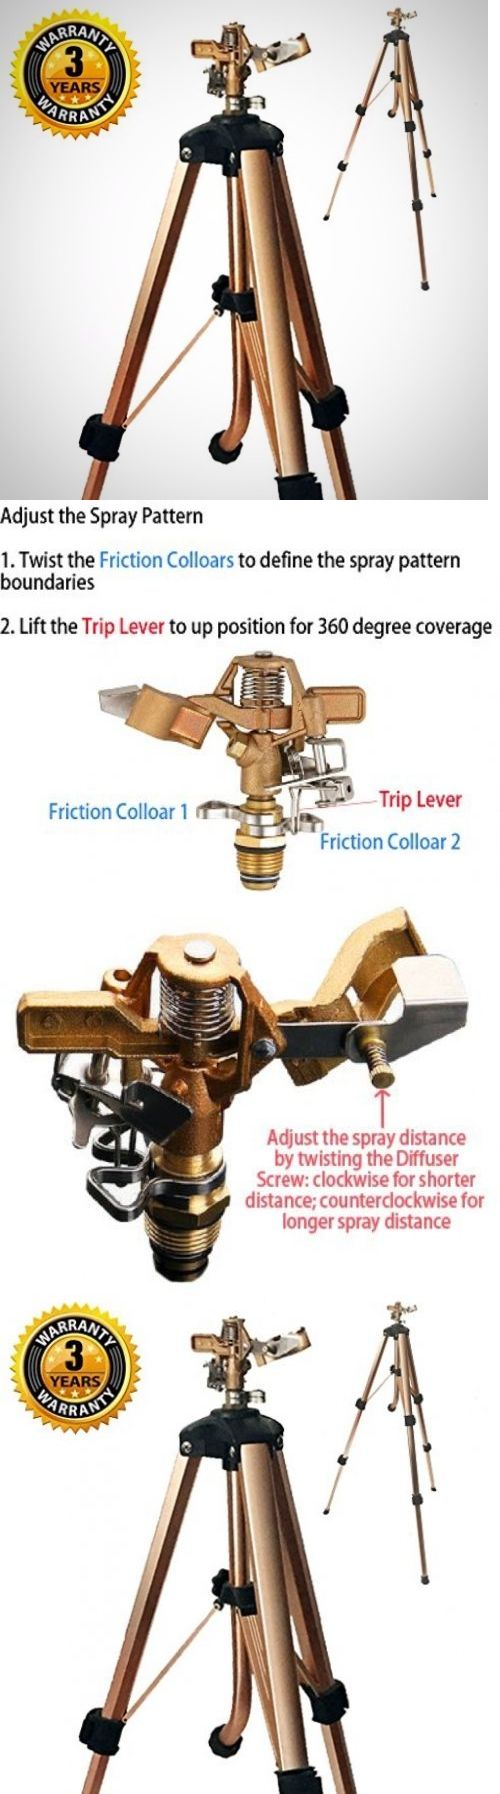 Lawn Sprinklers 20542: Brass Impact Tripod Sprinkler With Heavy Duty Brass Impact Sprinkler (25-48 ... -> BUY IT NOW ONLY: $38.01 on eBay!